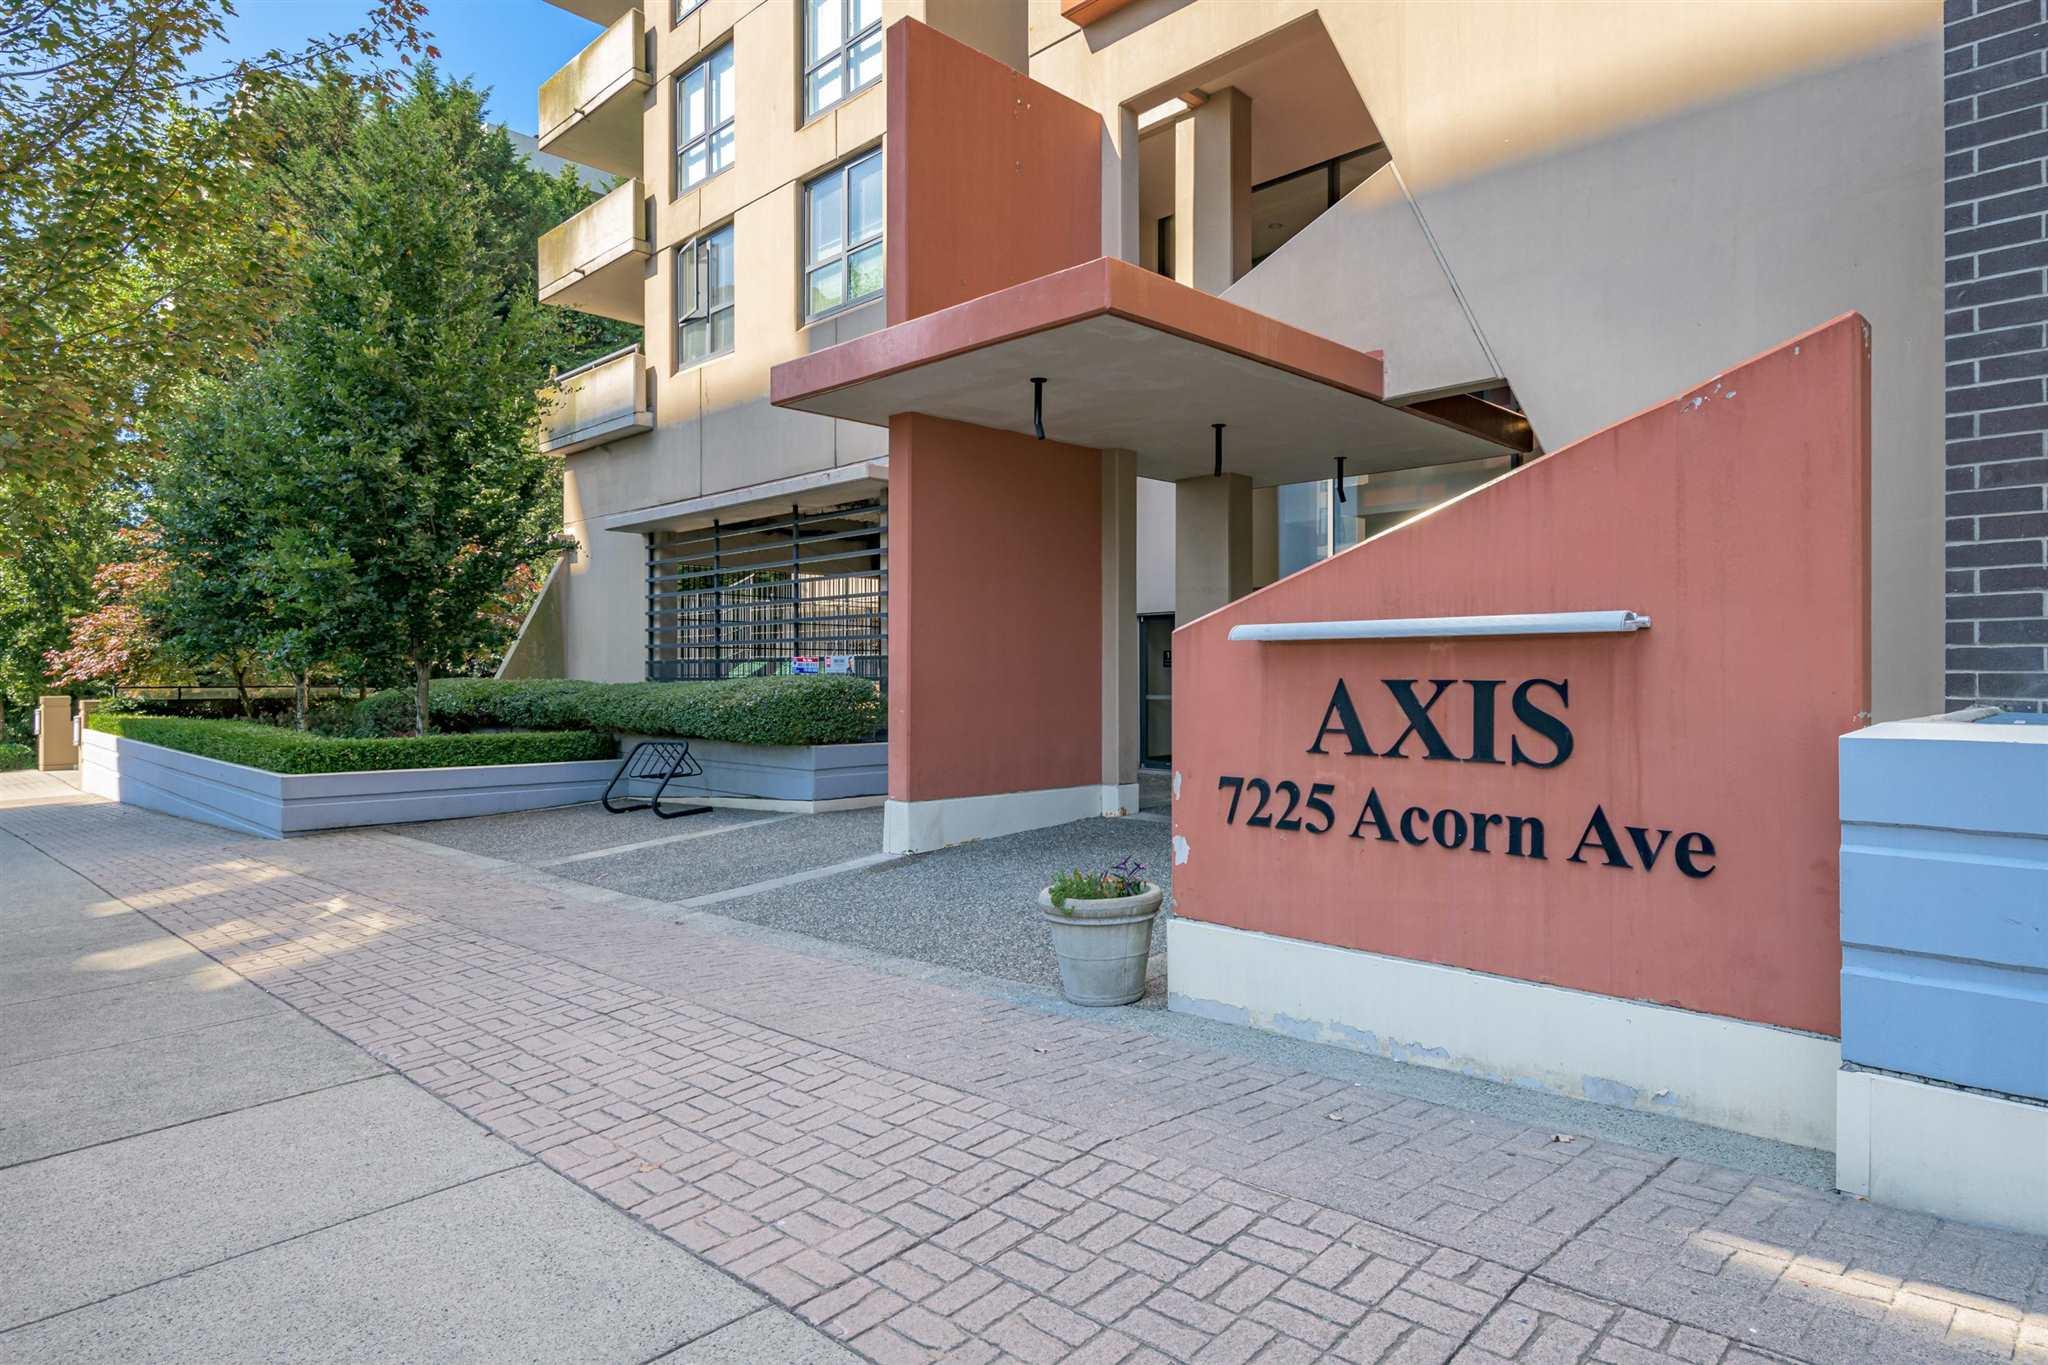 205 7225 ACORN AVENUE - Highgate Apartment/Condo for sale, 2 Bedrooms (R2606454) - #25